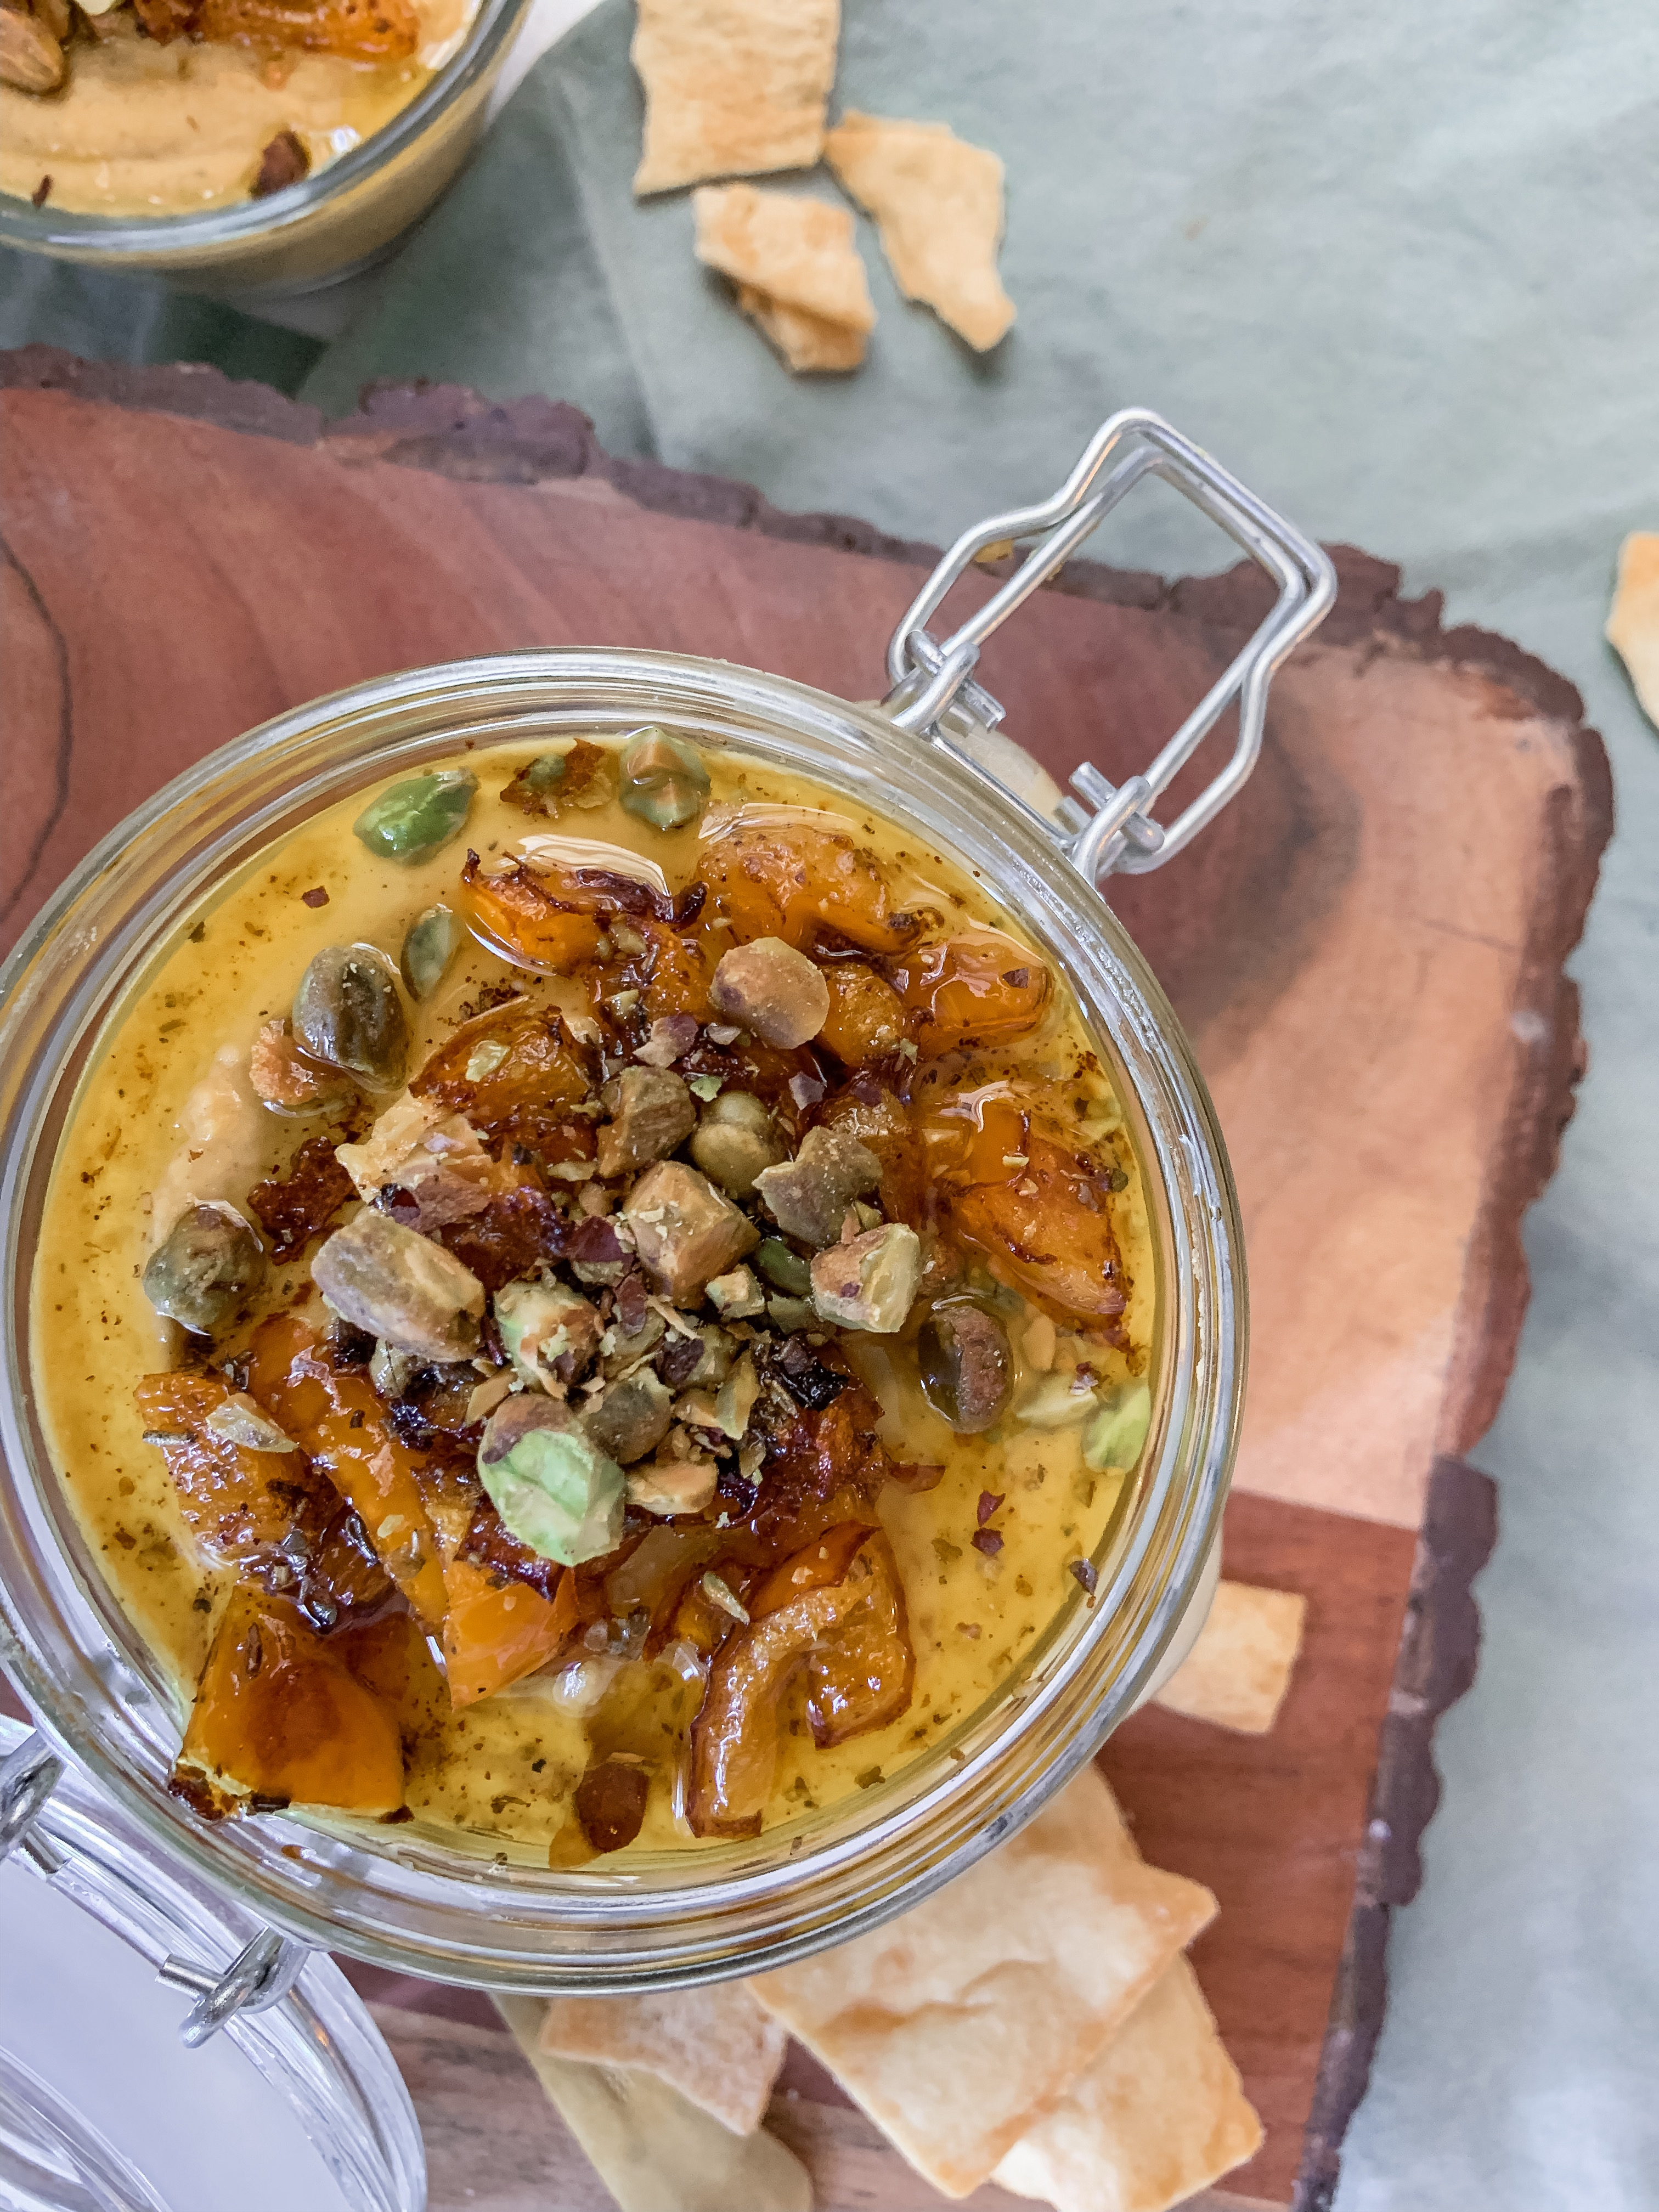 Easy to make Garbanzo Bean Hummus!